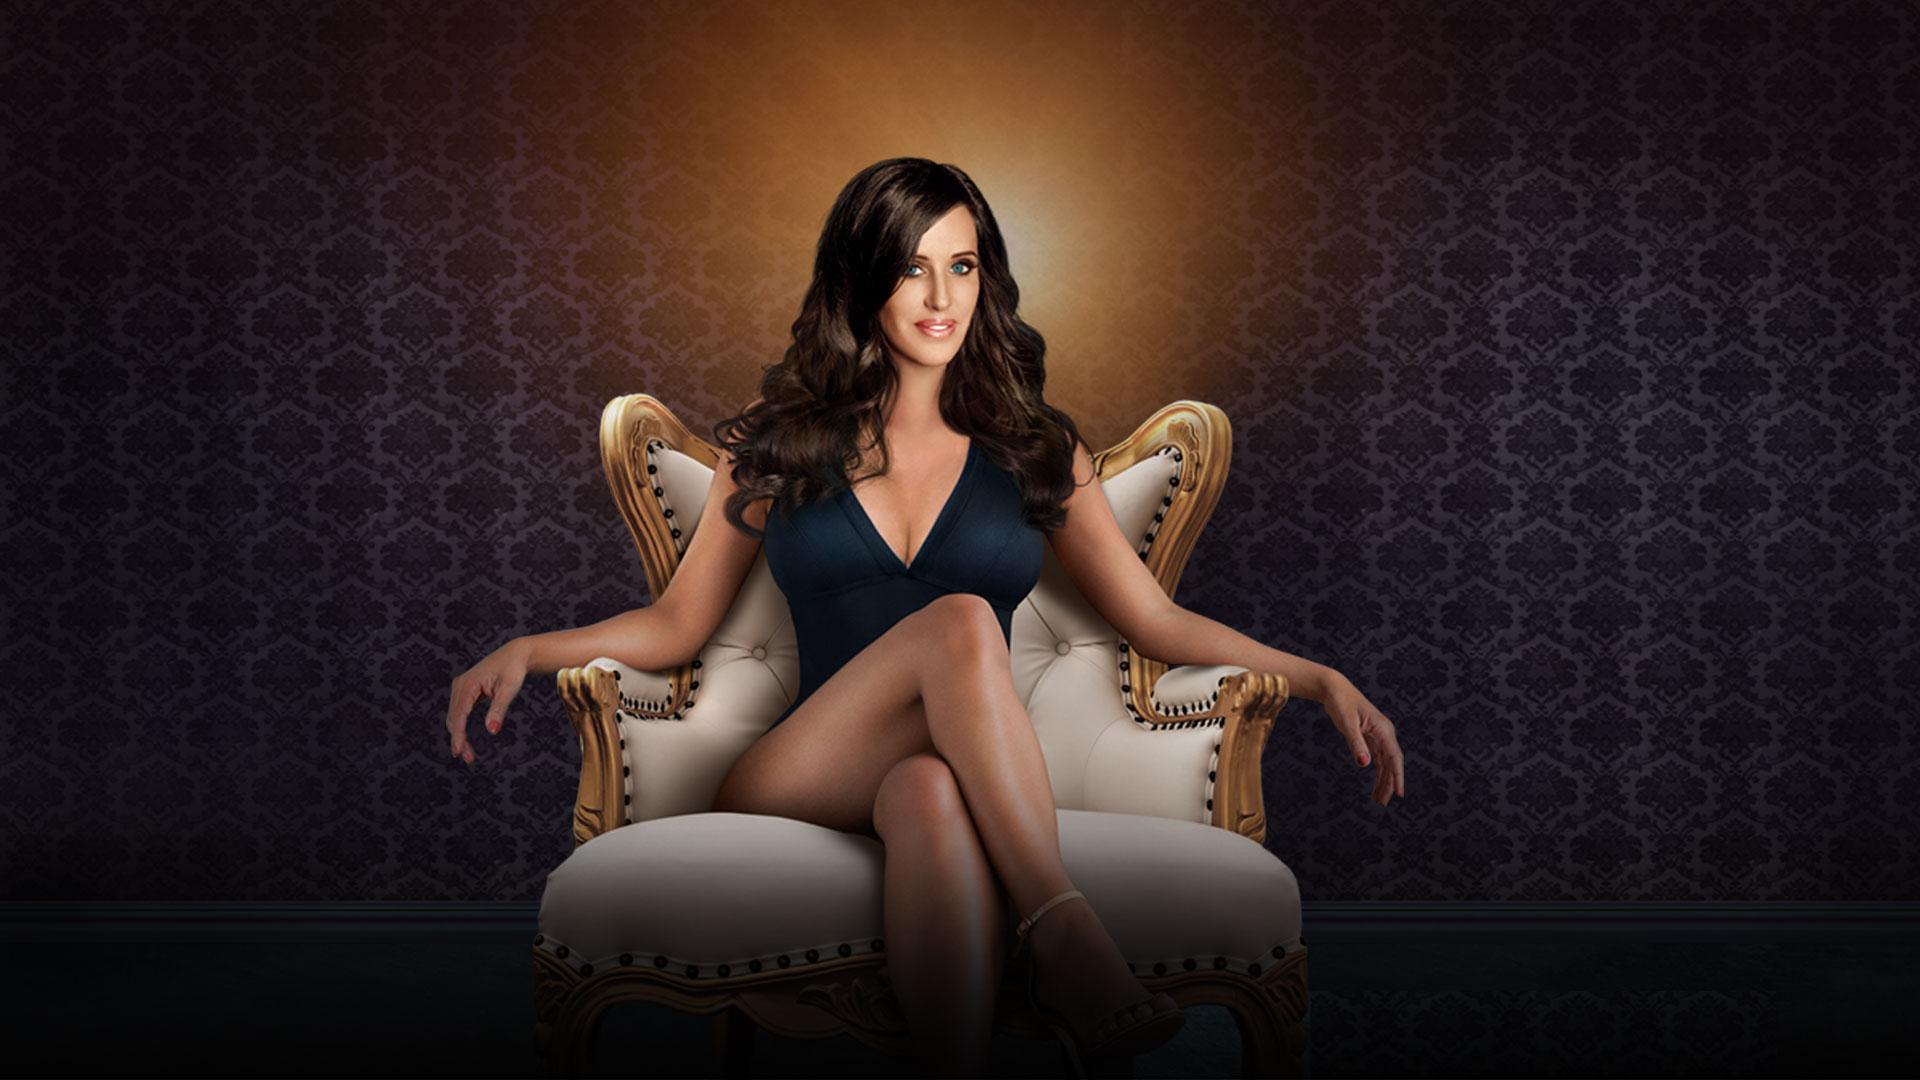 Millionaire matchmaker full episodes